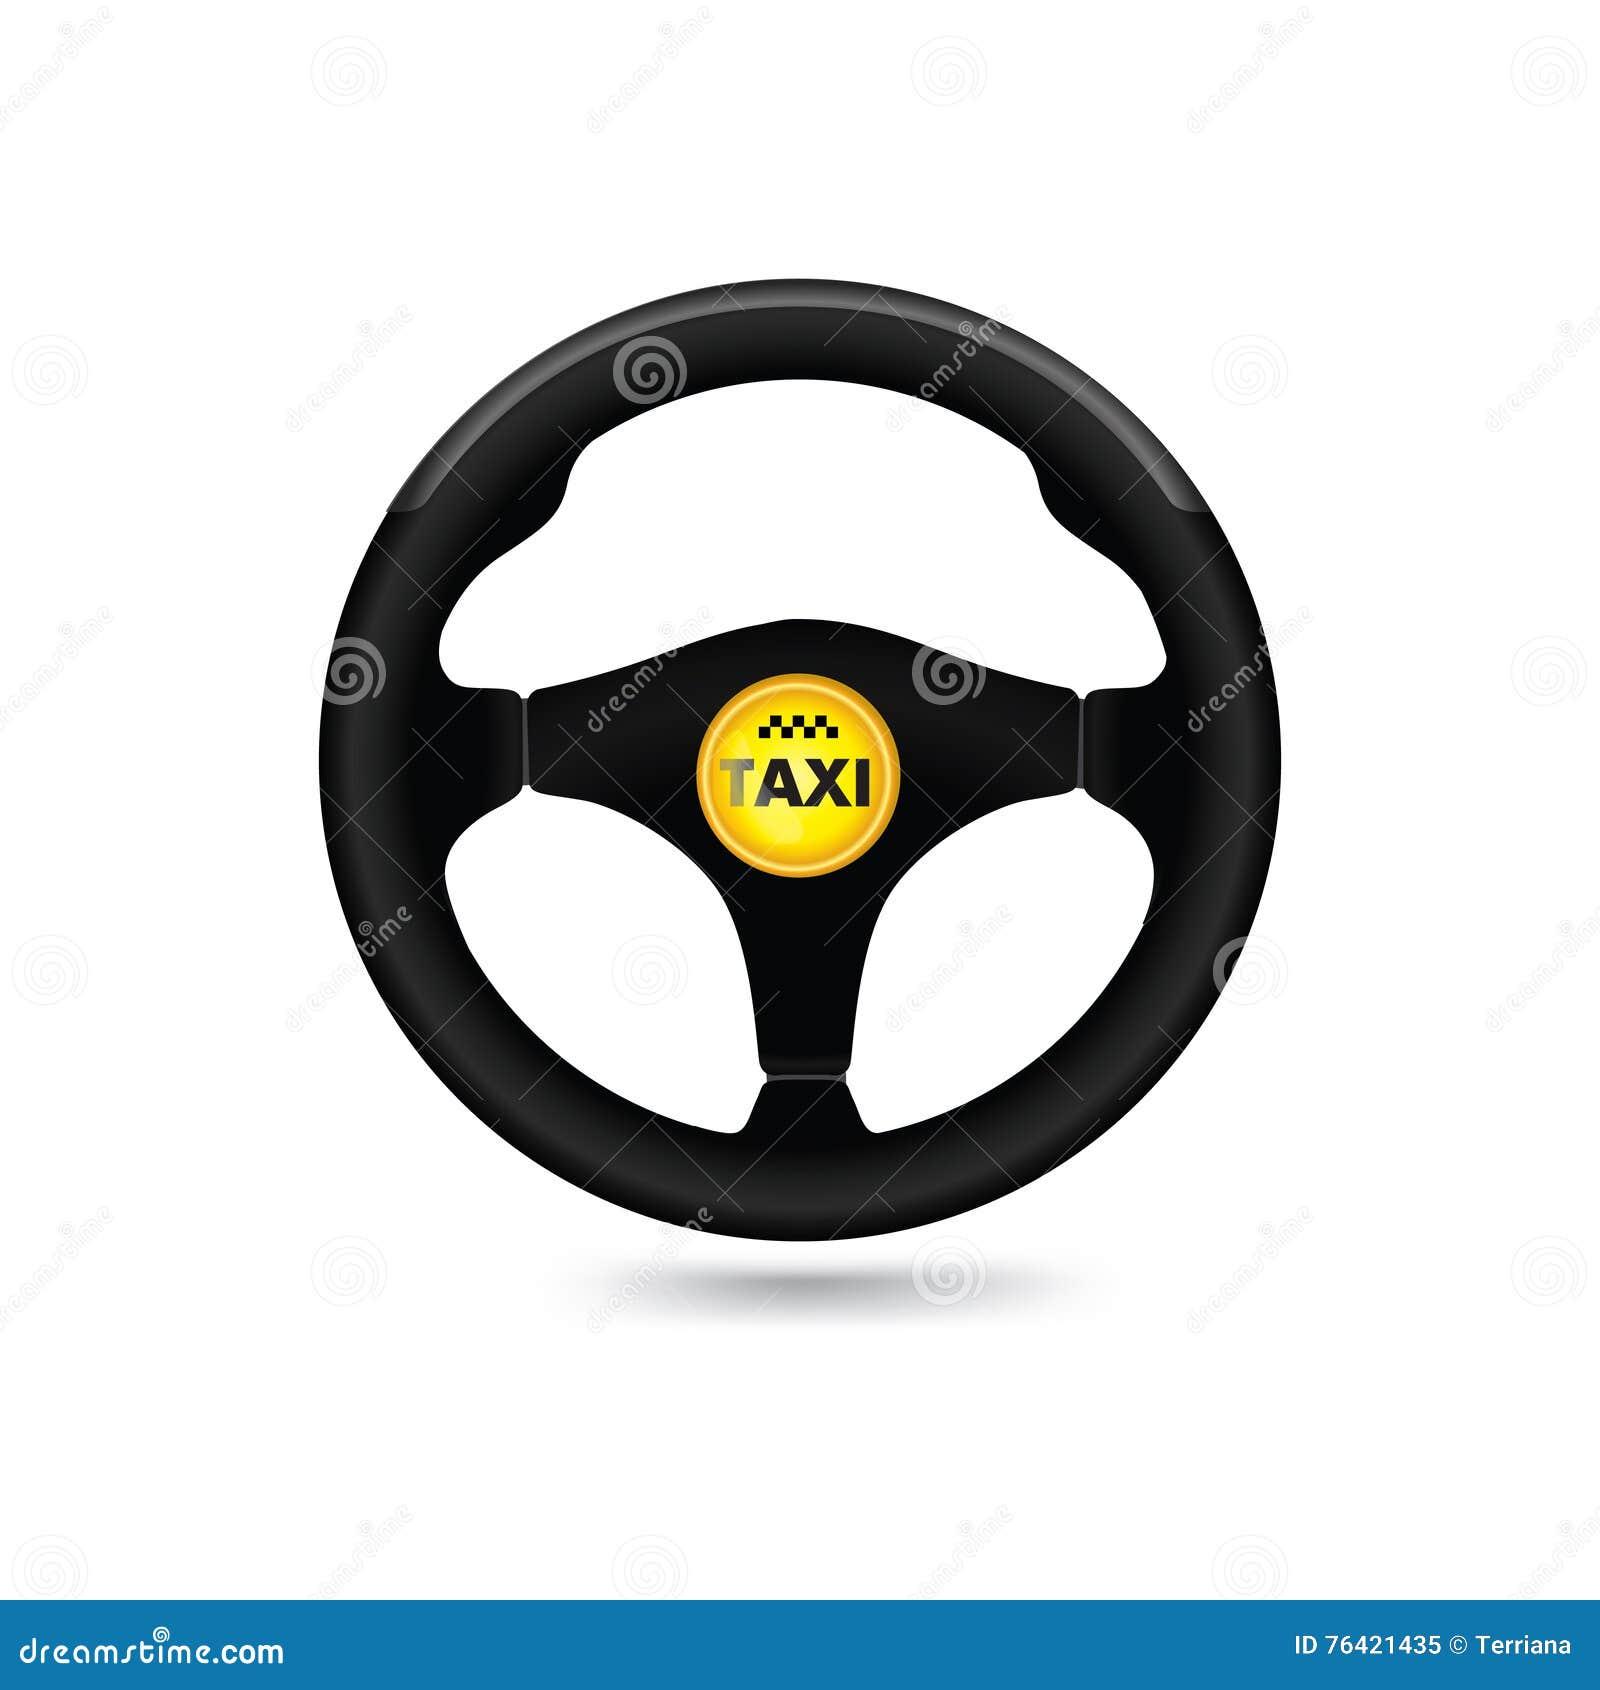 Taxi car sign. Car steering wheel icon. Vector